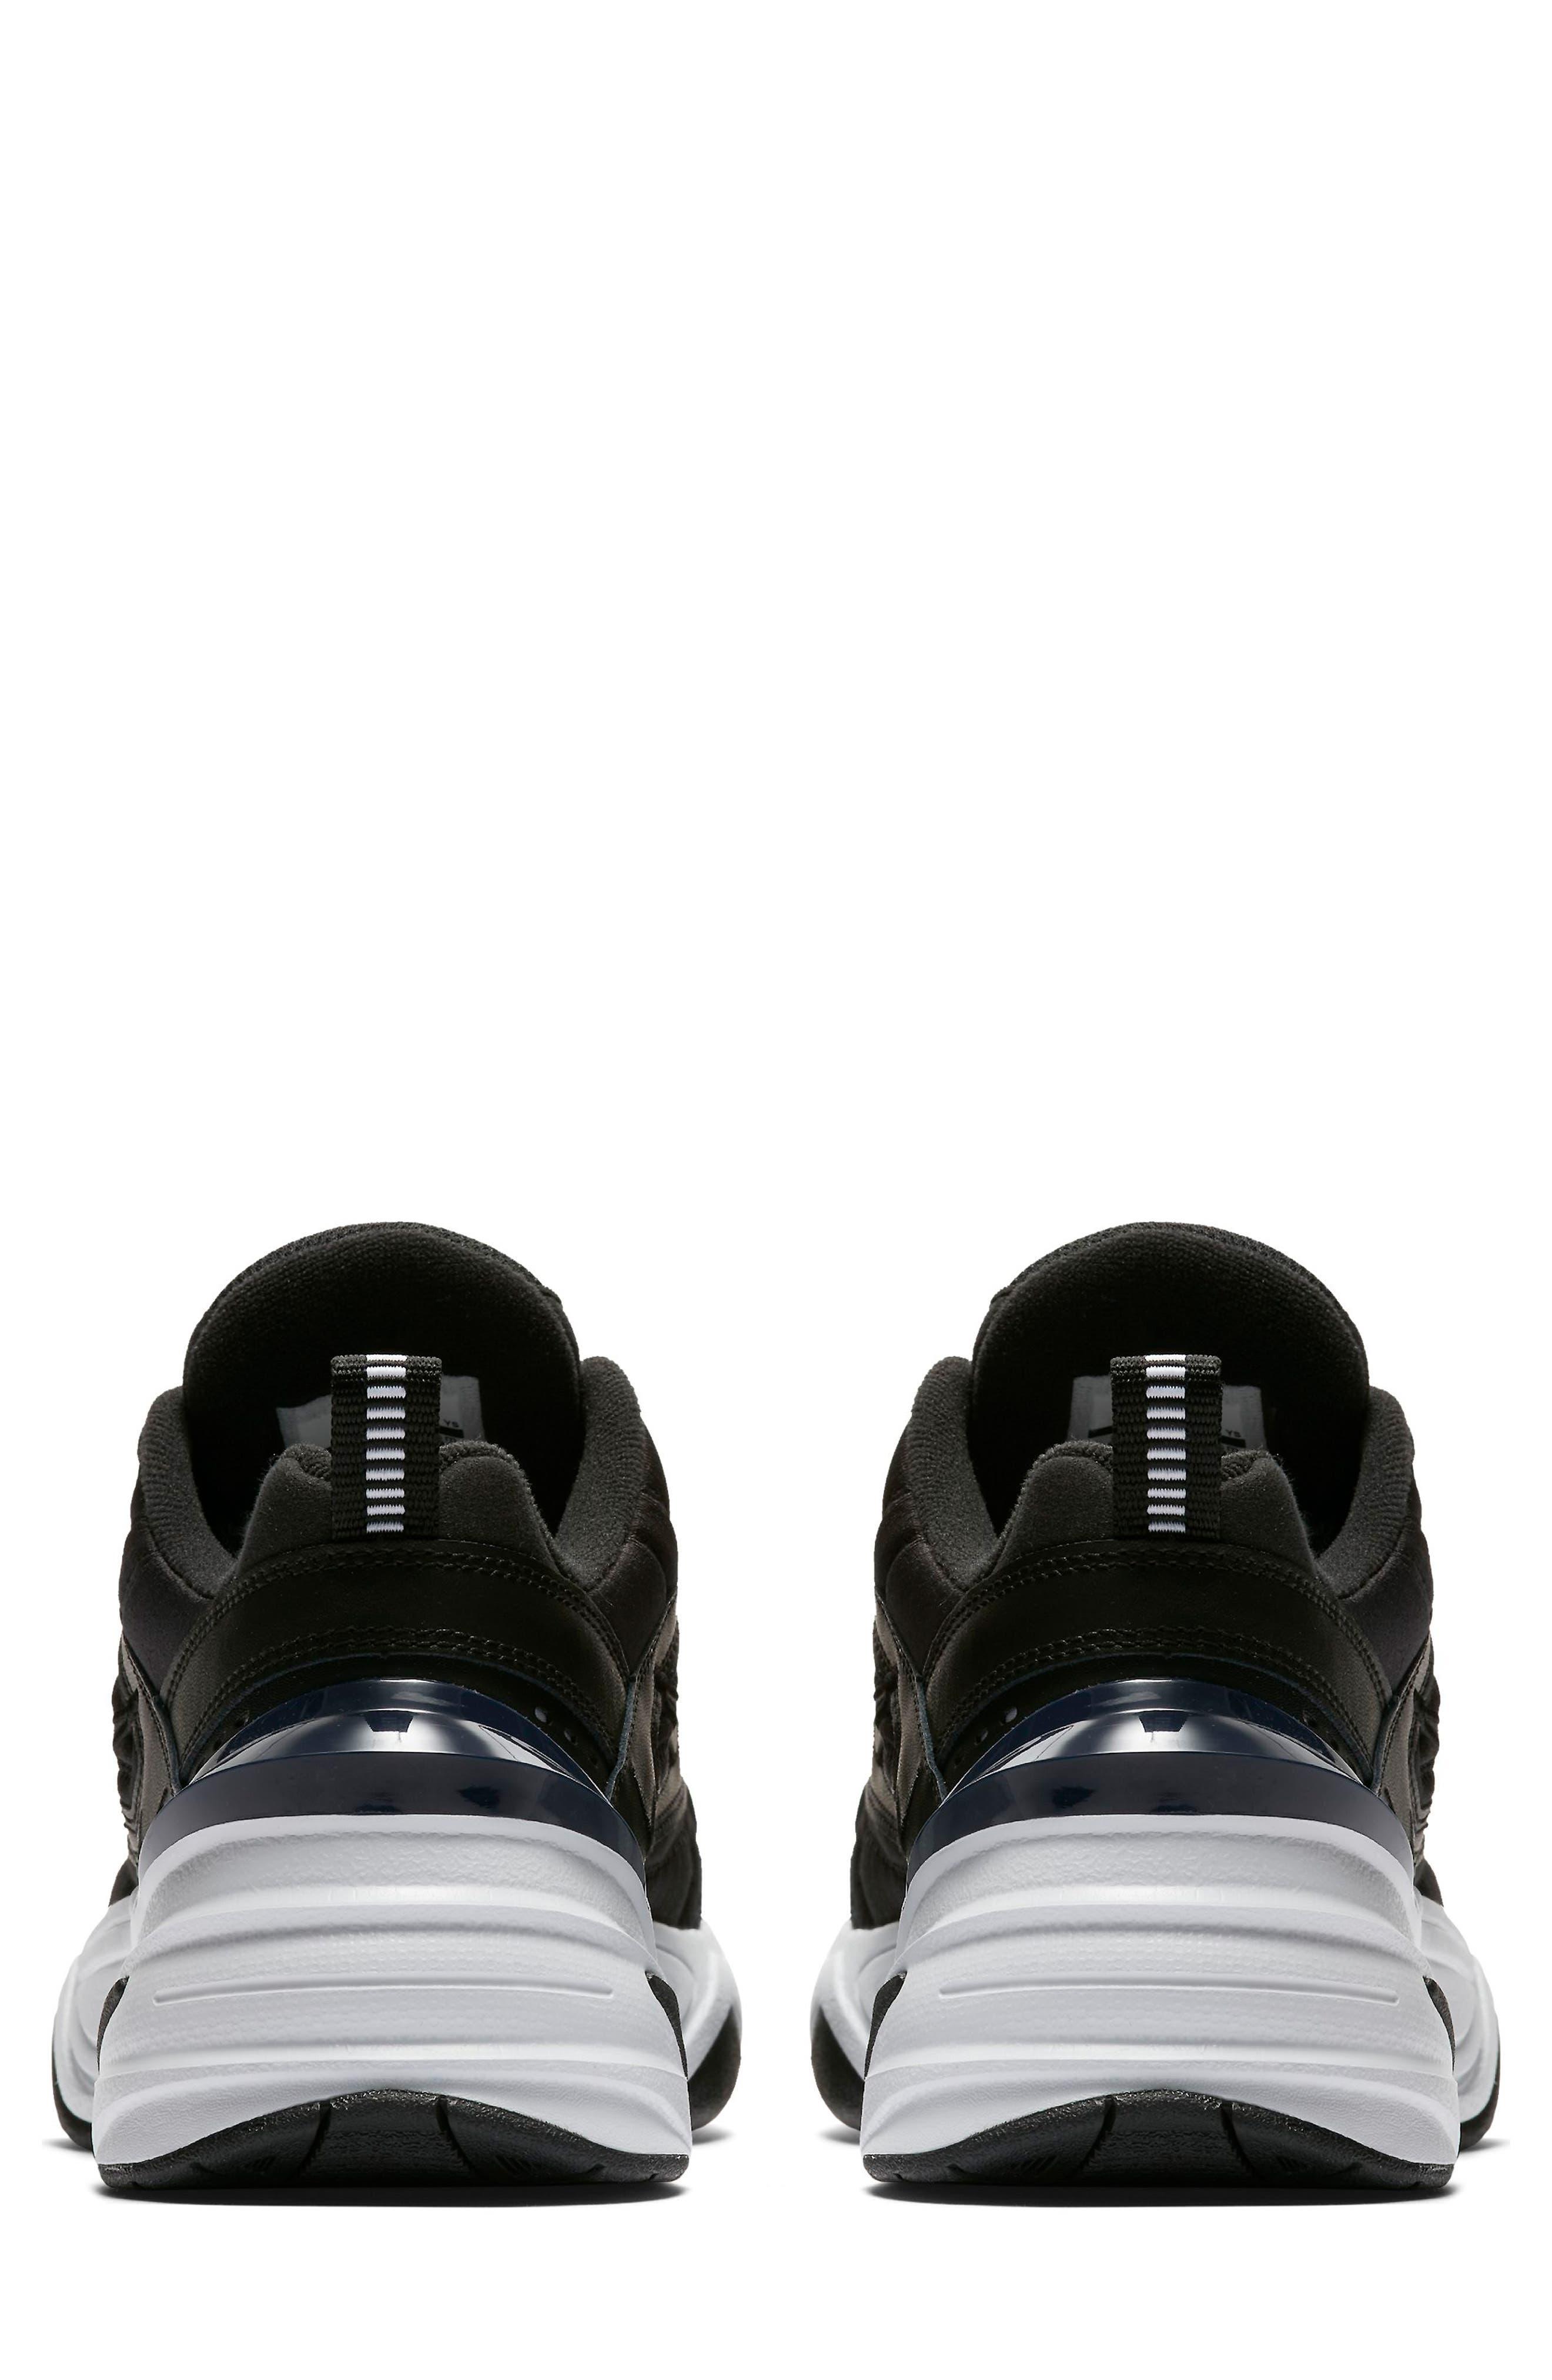 M2K Tekno Sneaker,                             Alternate thumbnail 2, color,                             BLACK/ OFF WHITE/ OBSIDIAN